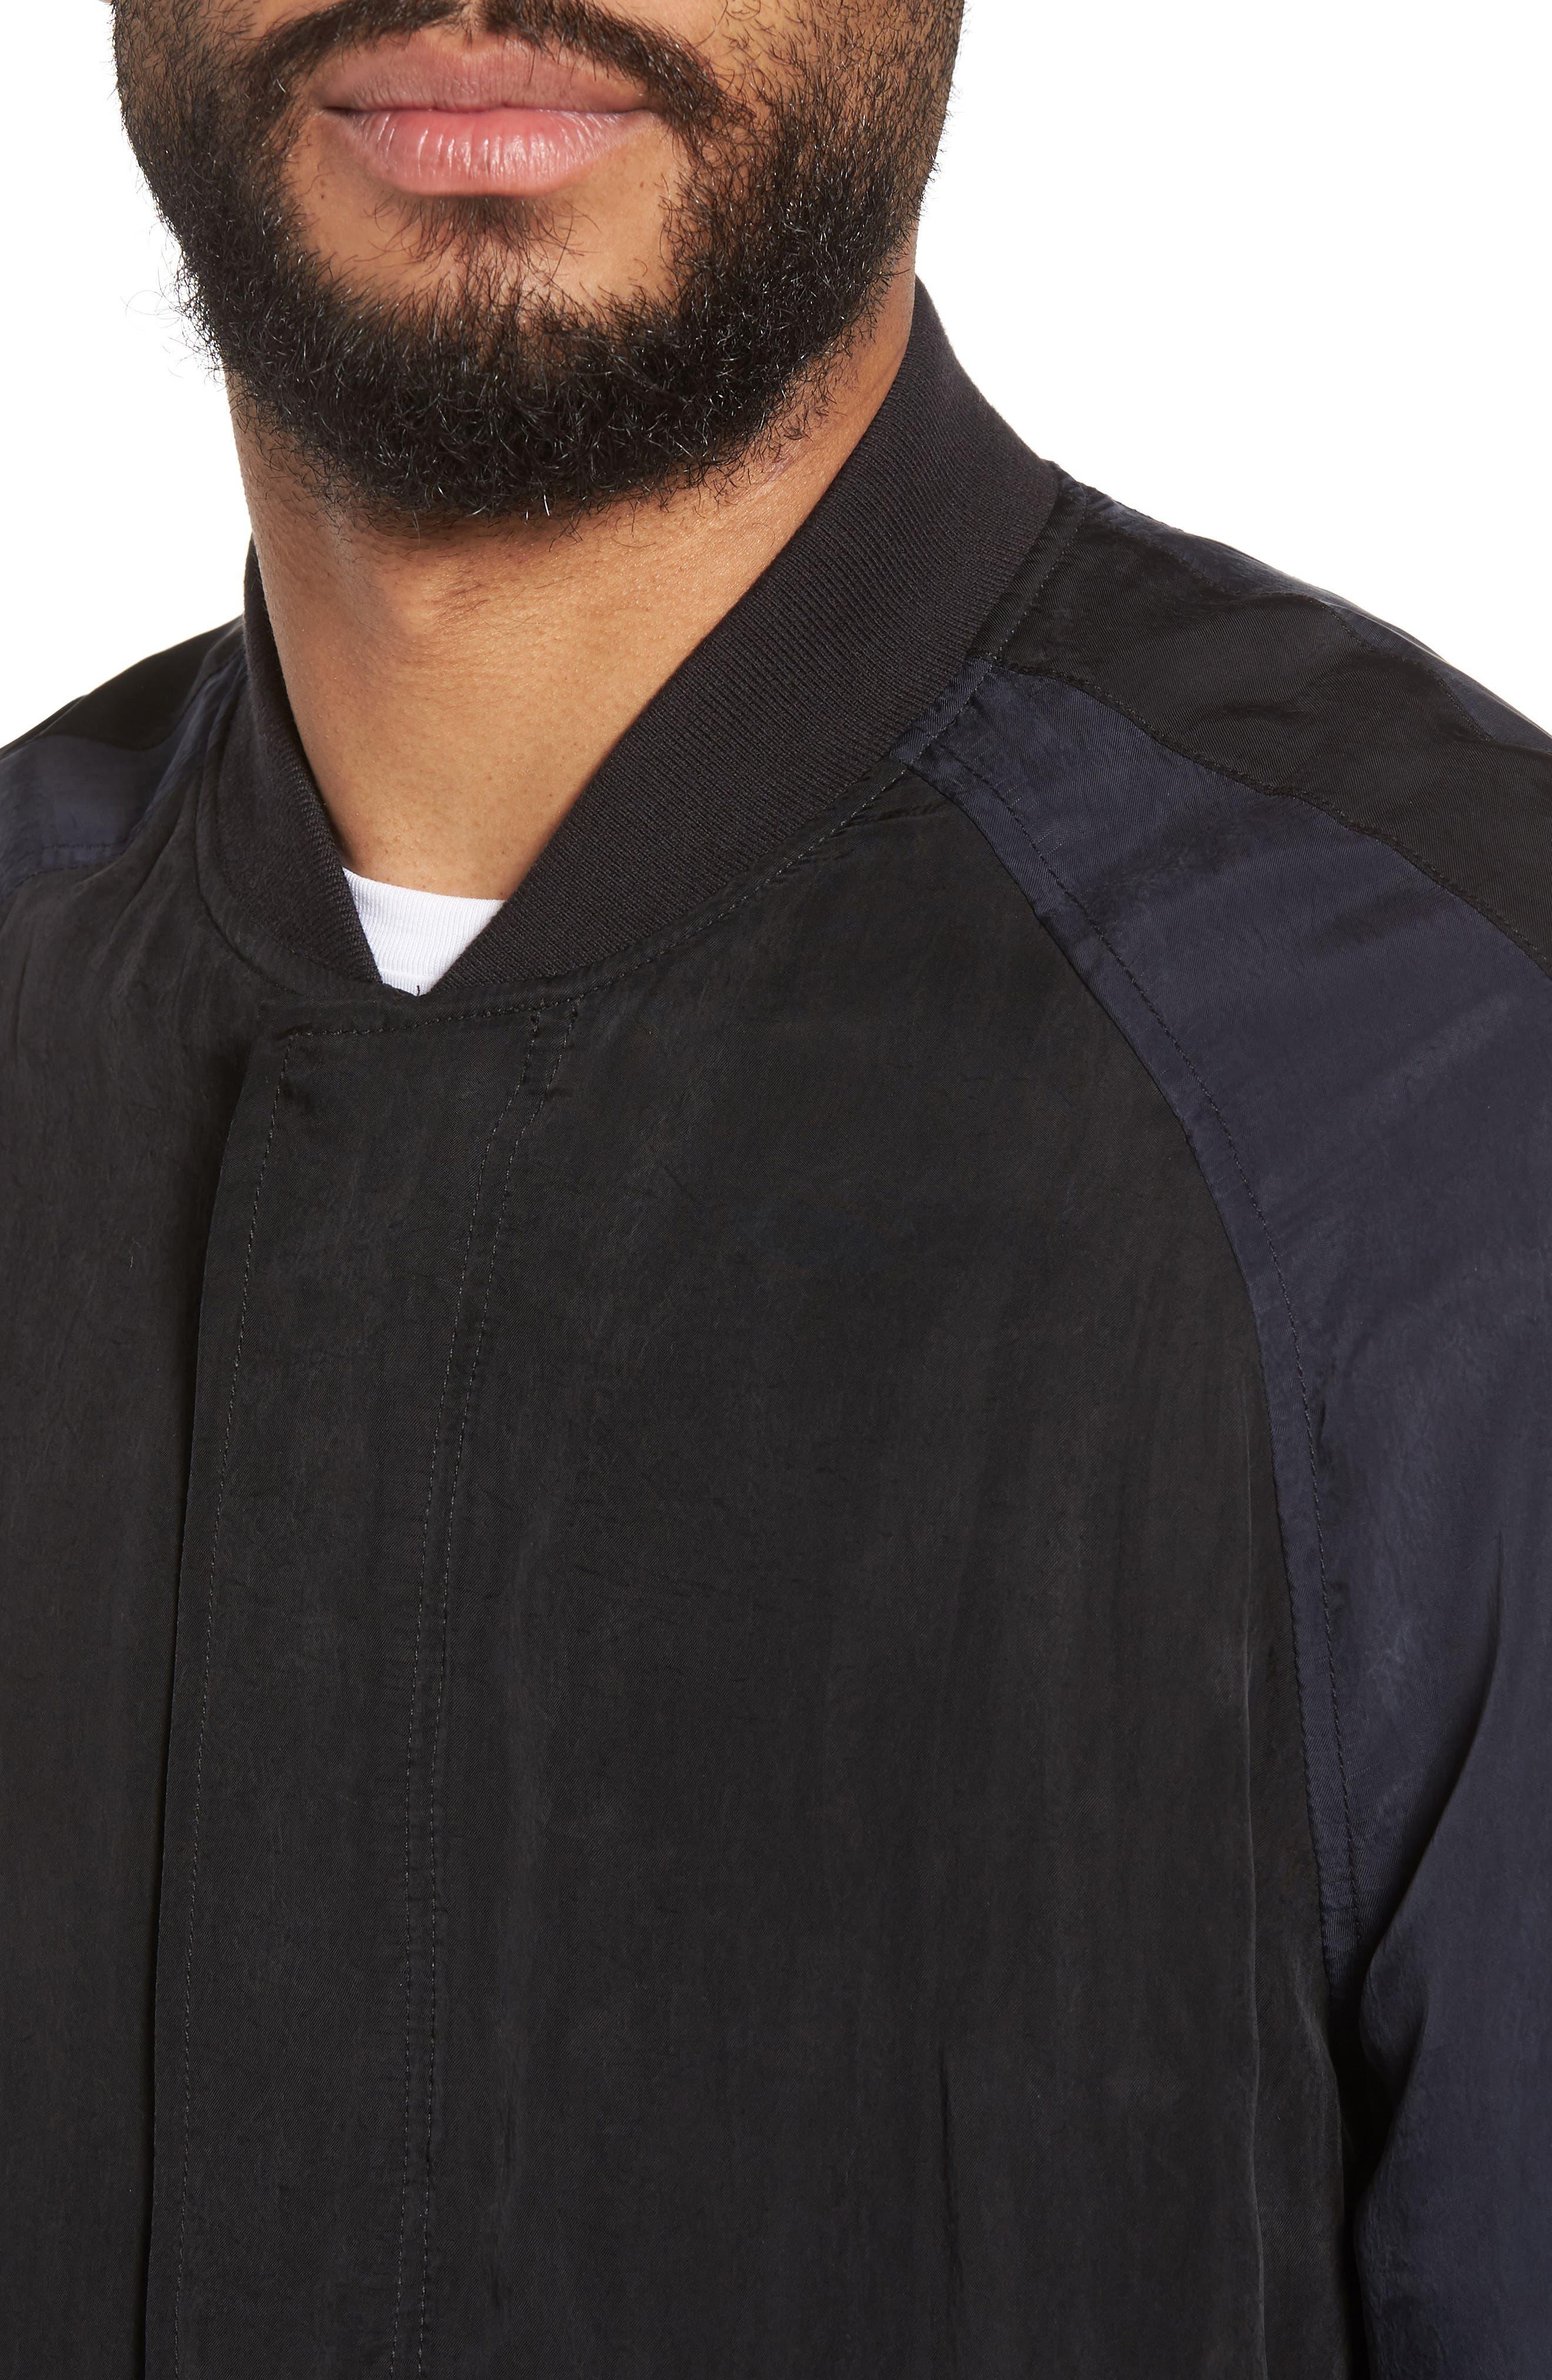 Colorblock Bomber Jacket,                             Alternate thumbnail 4, color,                             Black/ Mechanic Blue